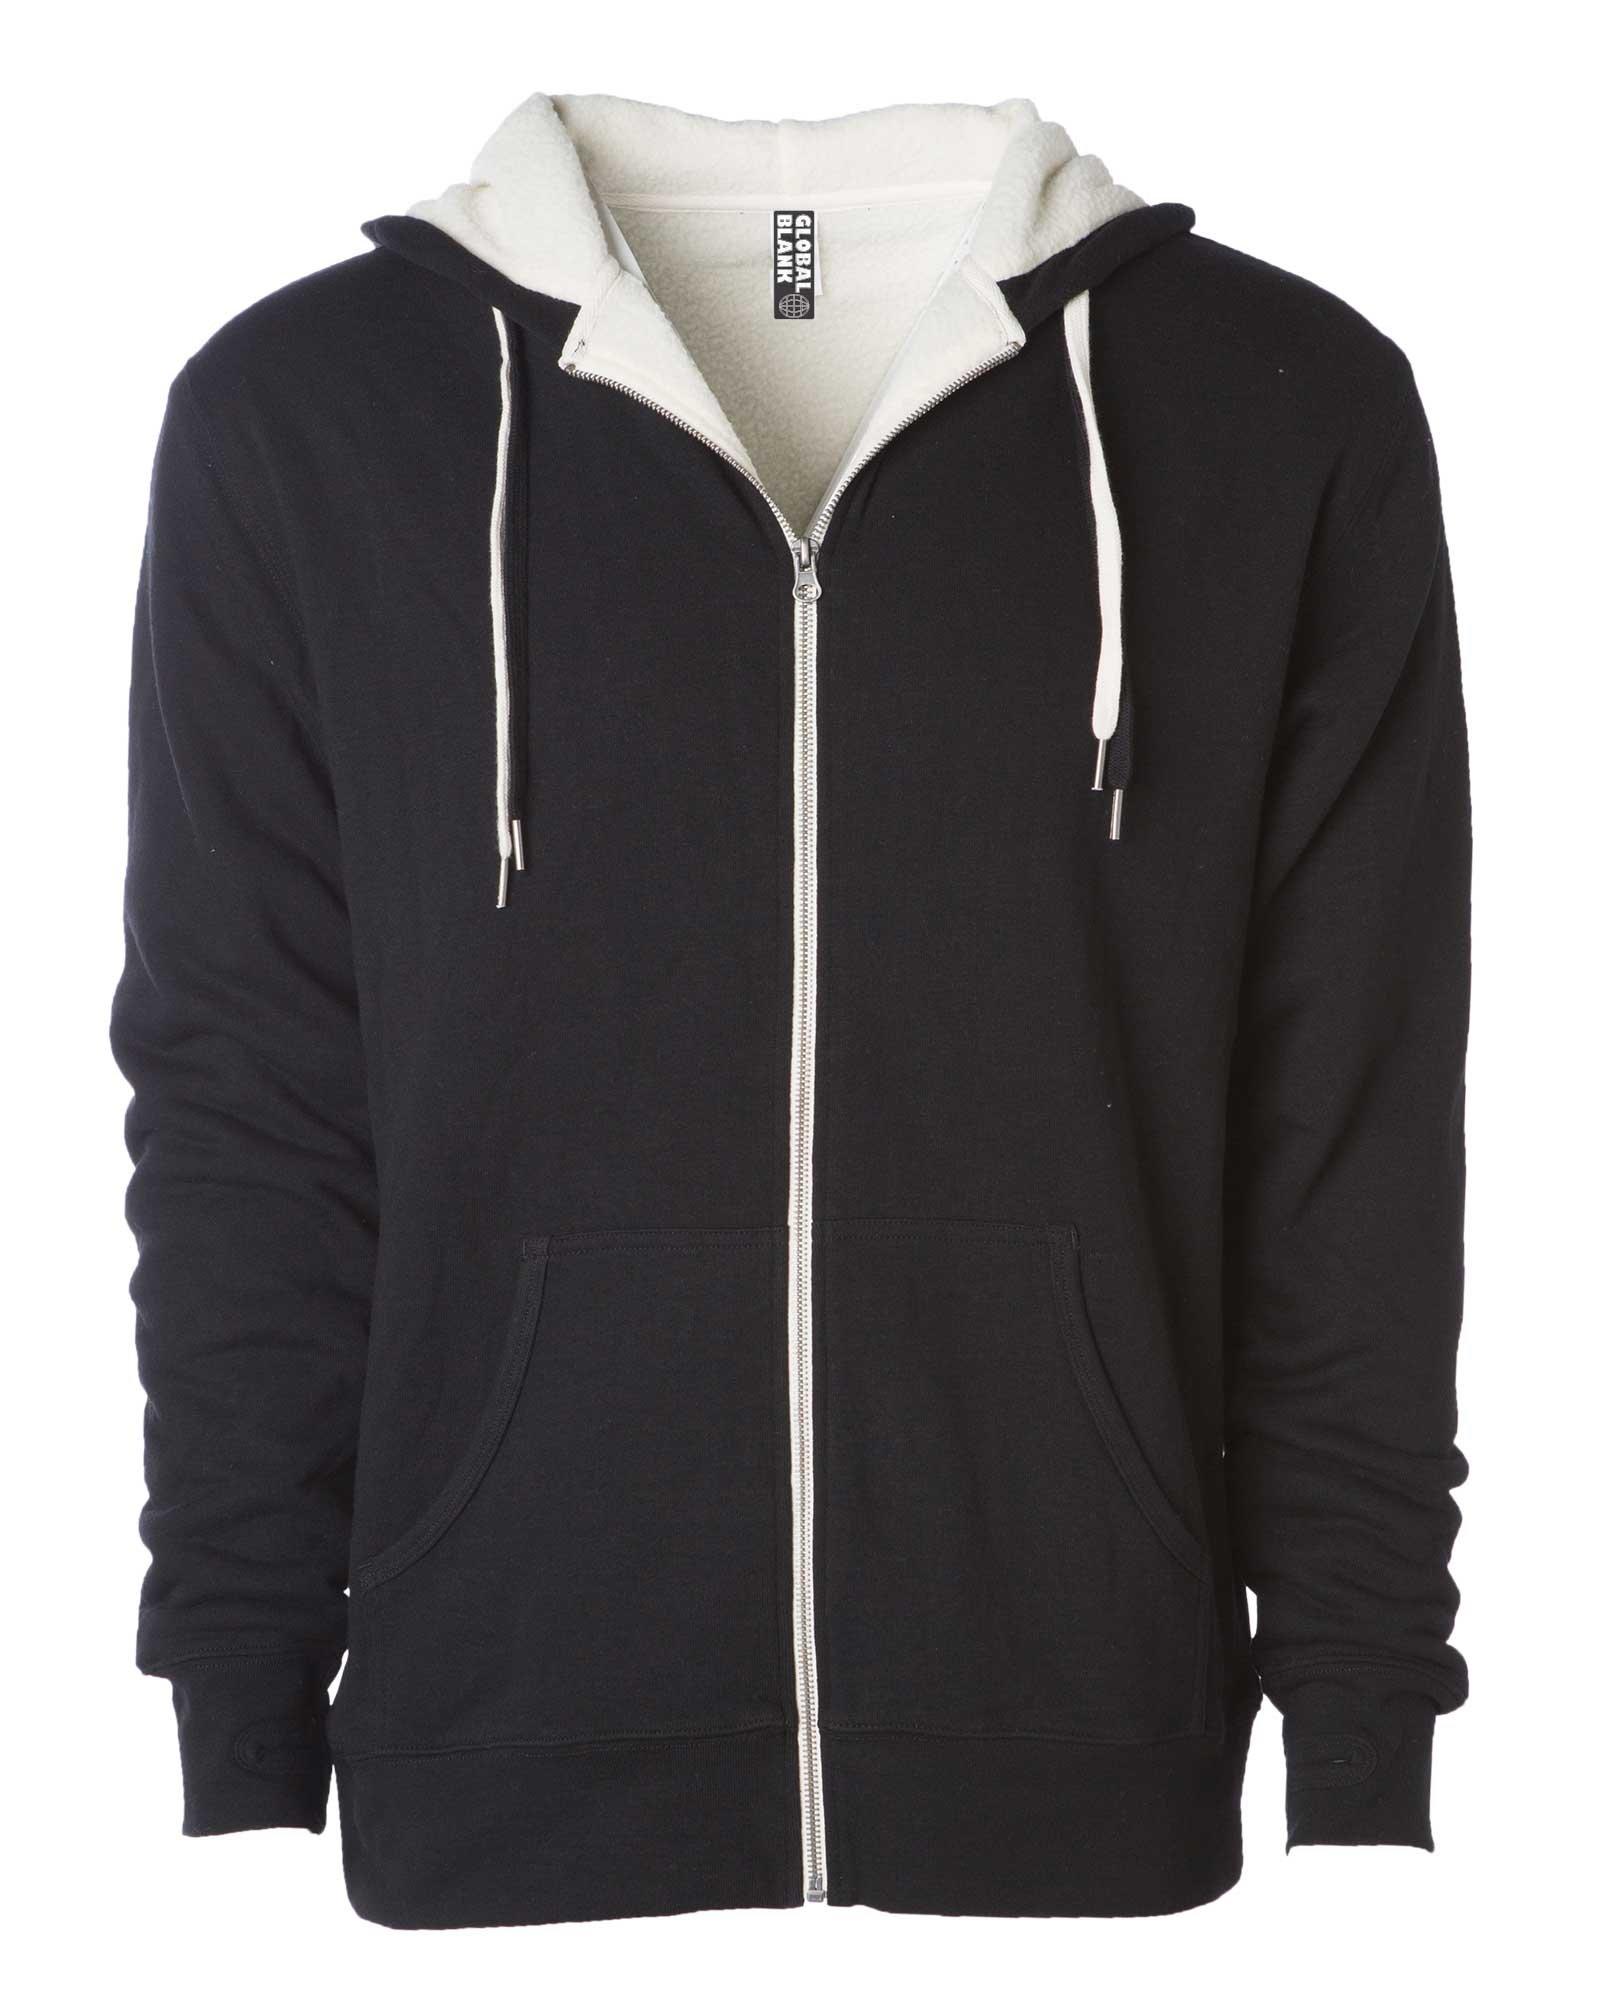 Global Heavyweight Sherpa Lined Zip Up Hoodie for Men Hooded Sweatshirt Fleece Jacket Black XXL by Global Blank